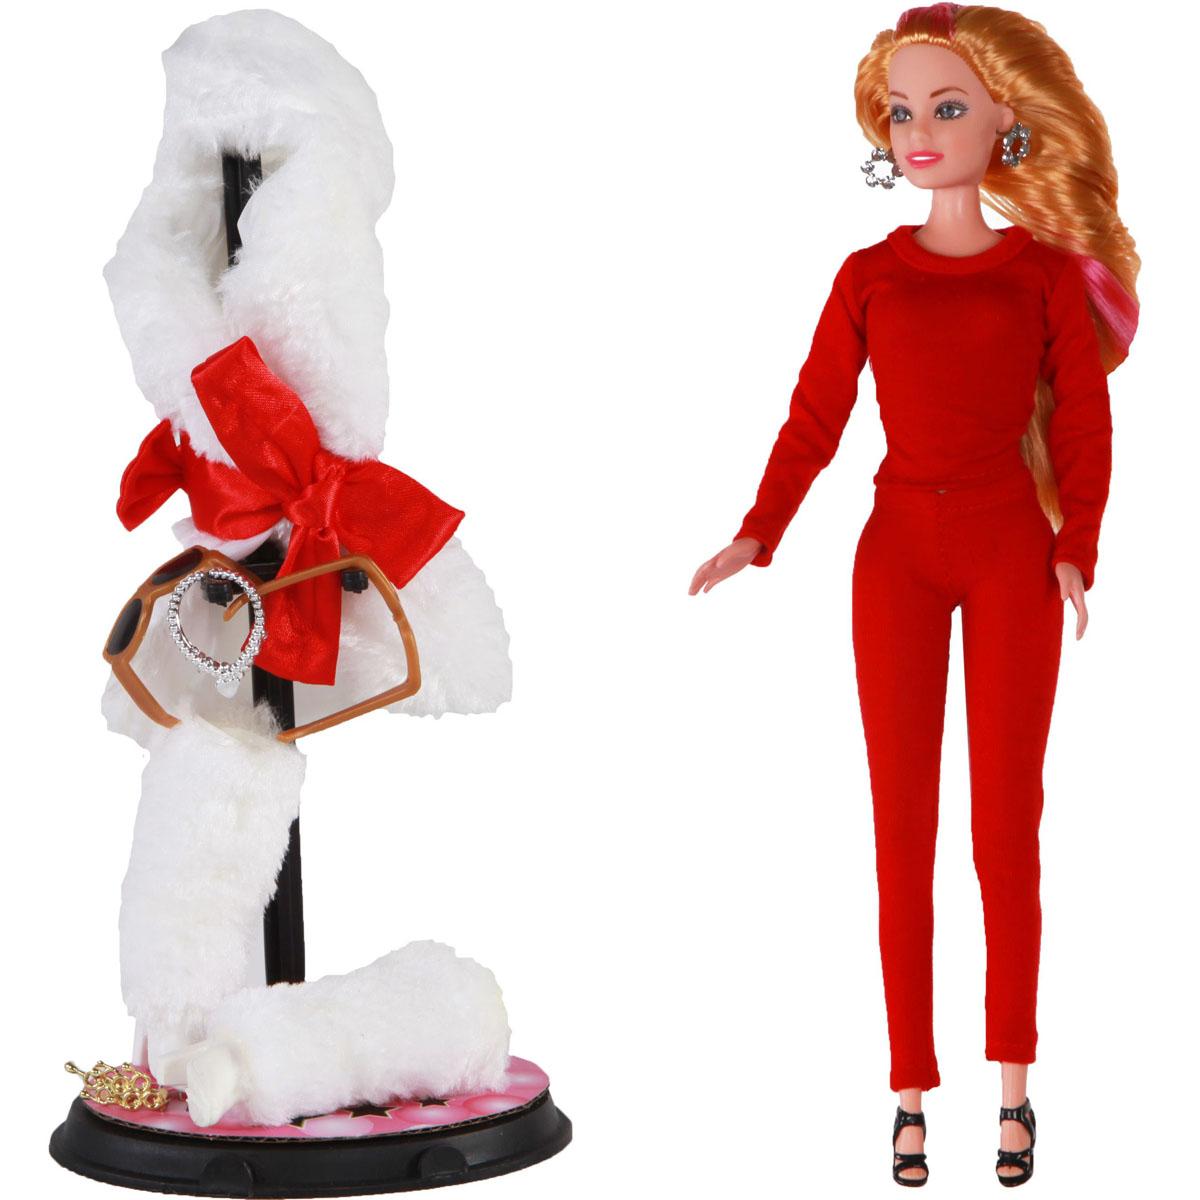 Yako Кукла Натали M6581-1 куклы и одежда для кукол yako кукла софи m6579 4